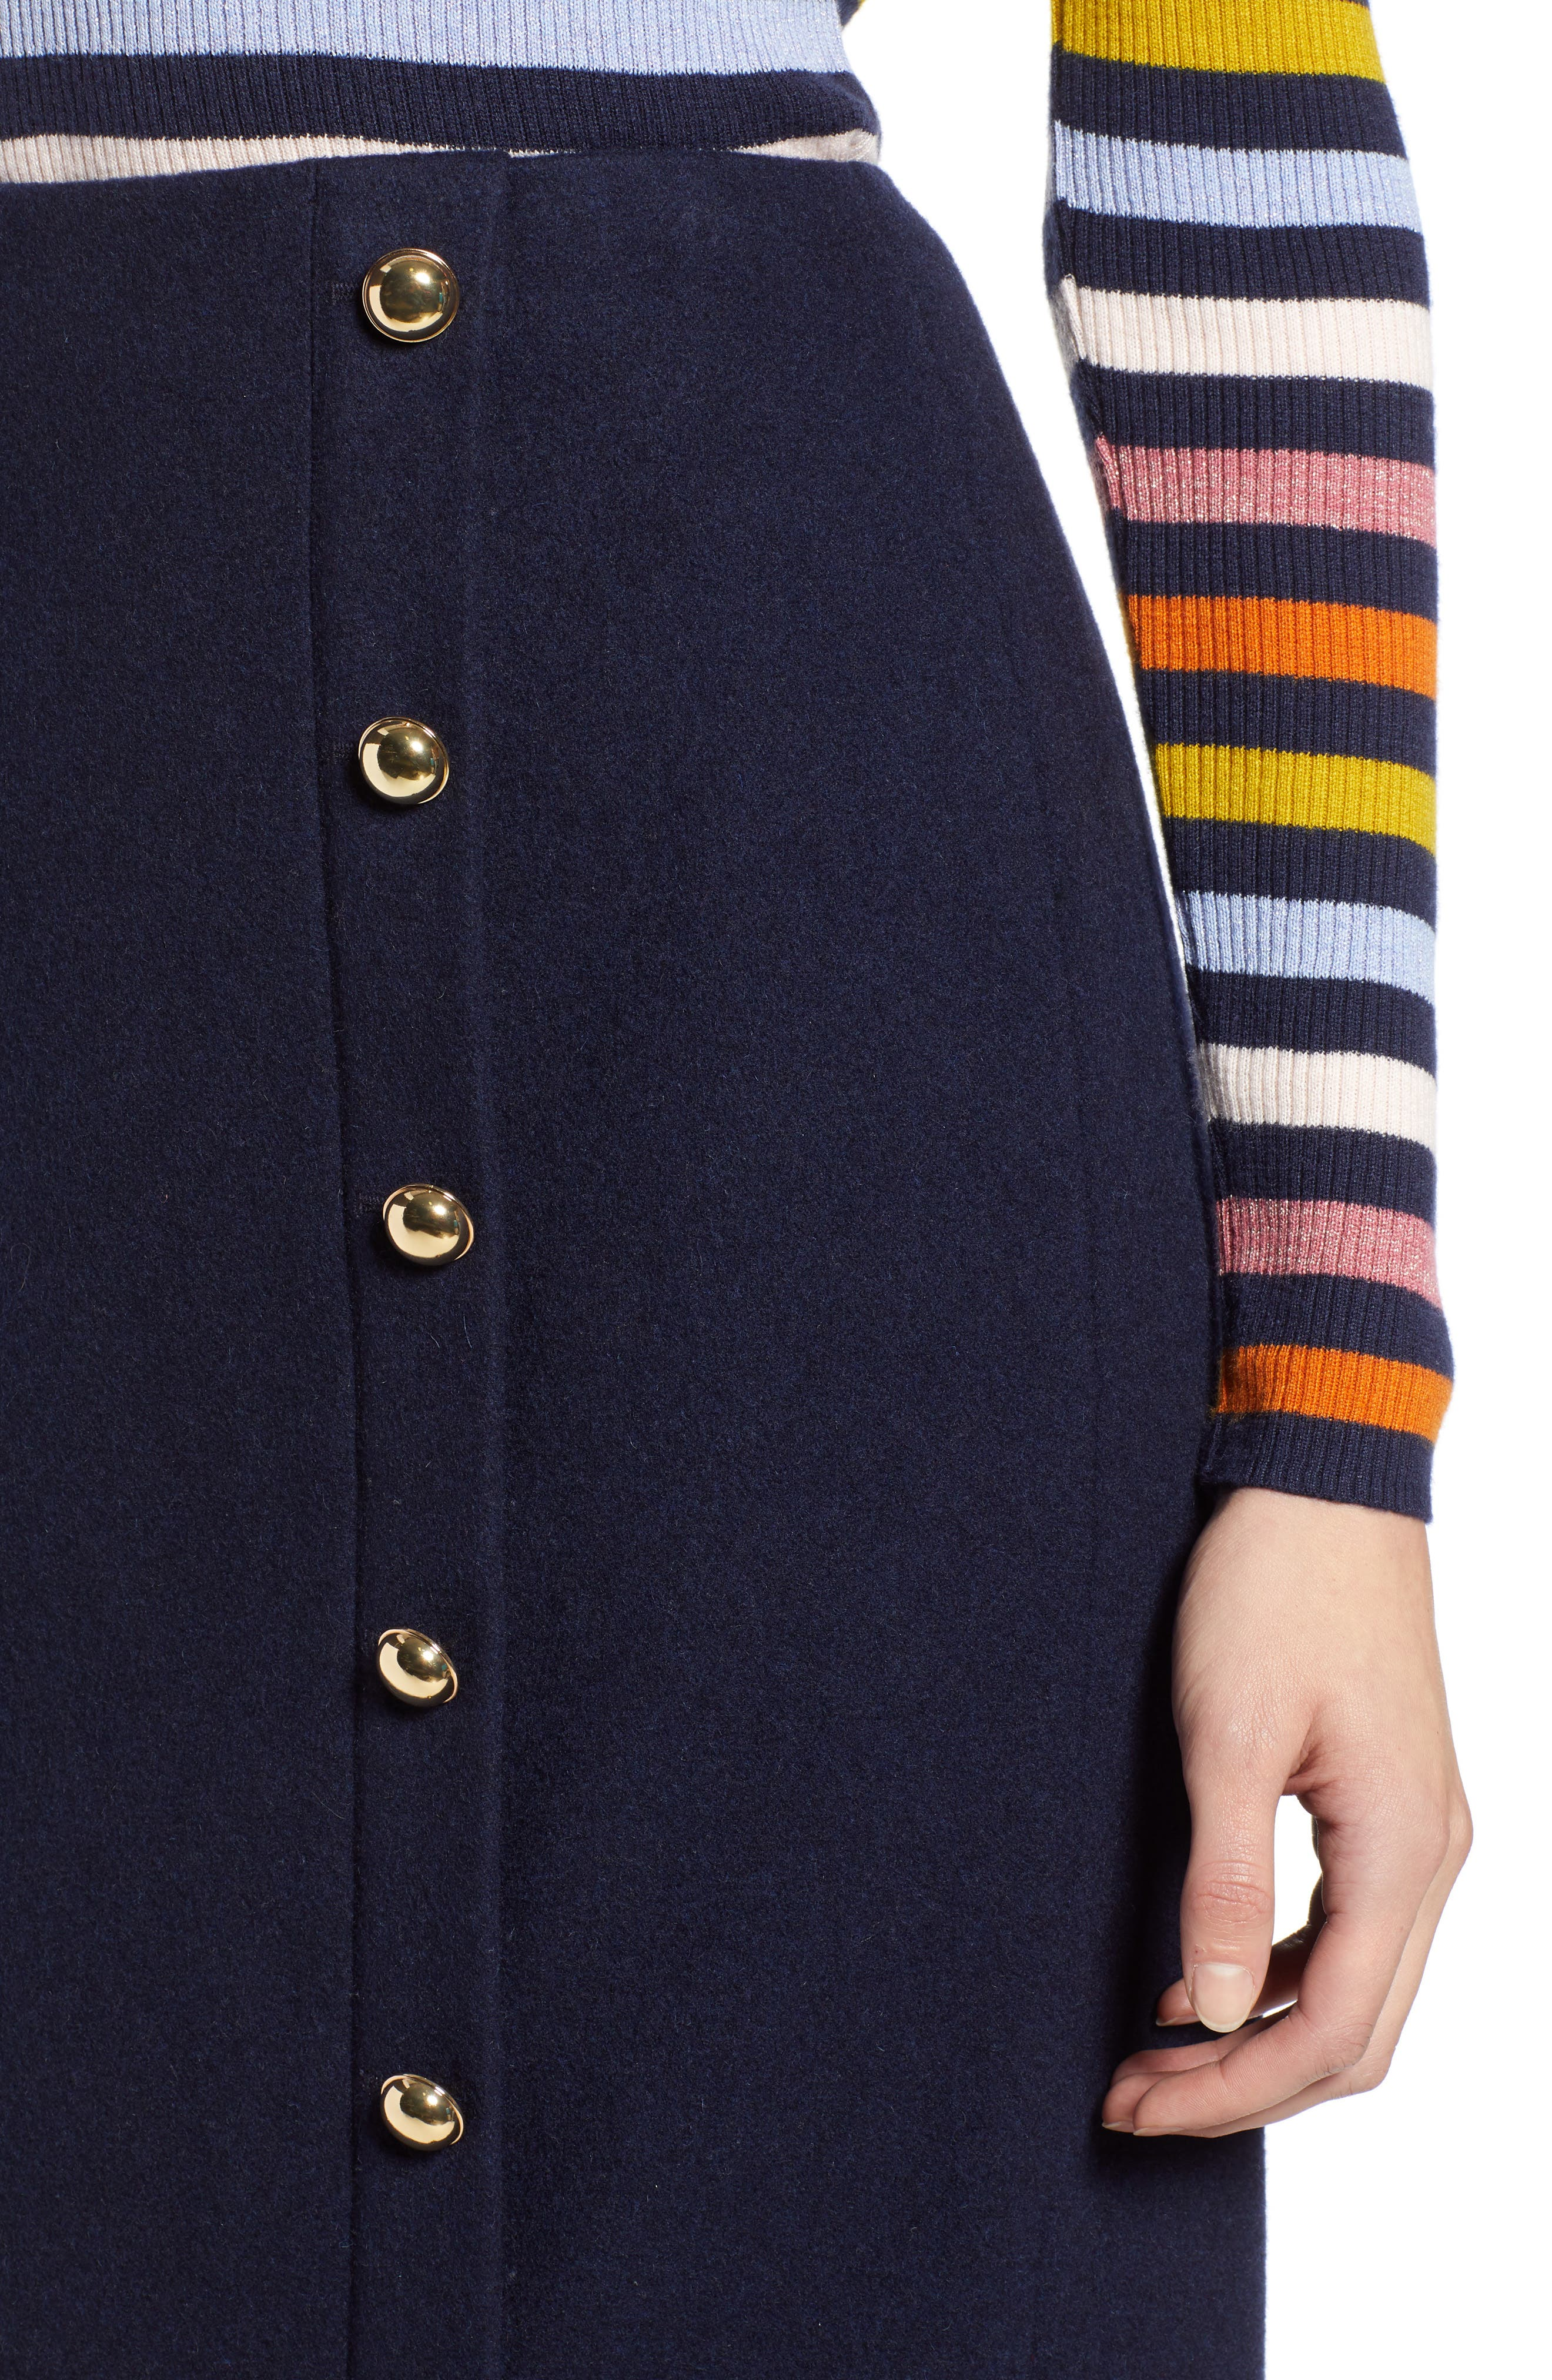 x Atlantic-Pacific Wrap Pencil Skirt,                             Alternate thumbnail 4, color,                             NAVY BLAZER